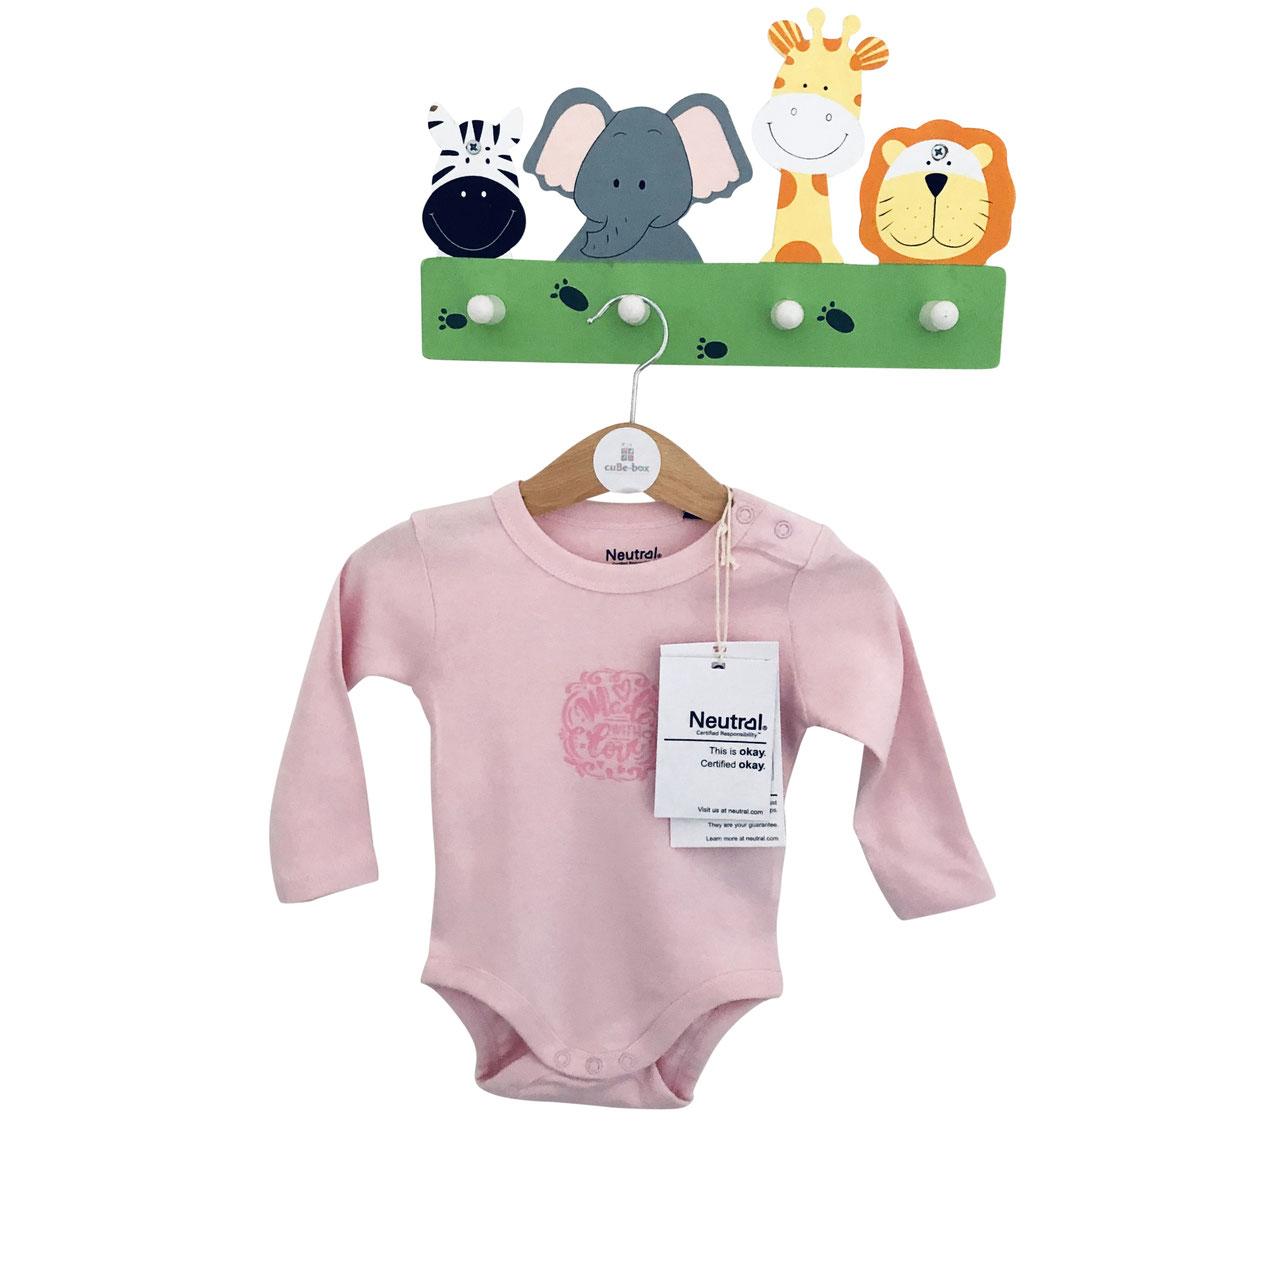 cuBe-box-Babygeschenke-body-rosa-garderobe